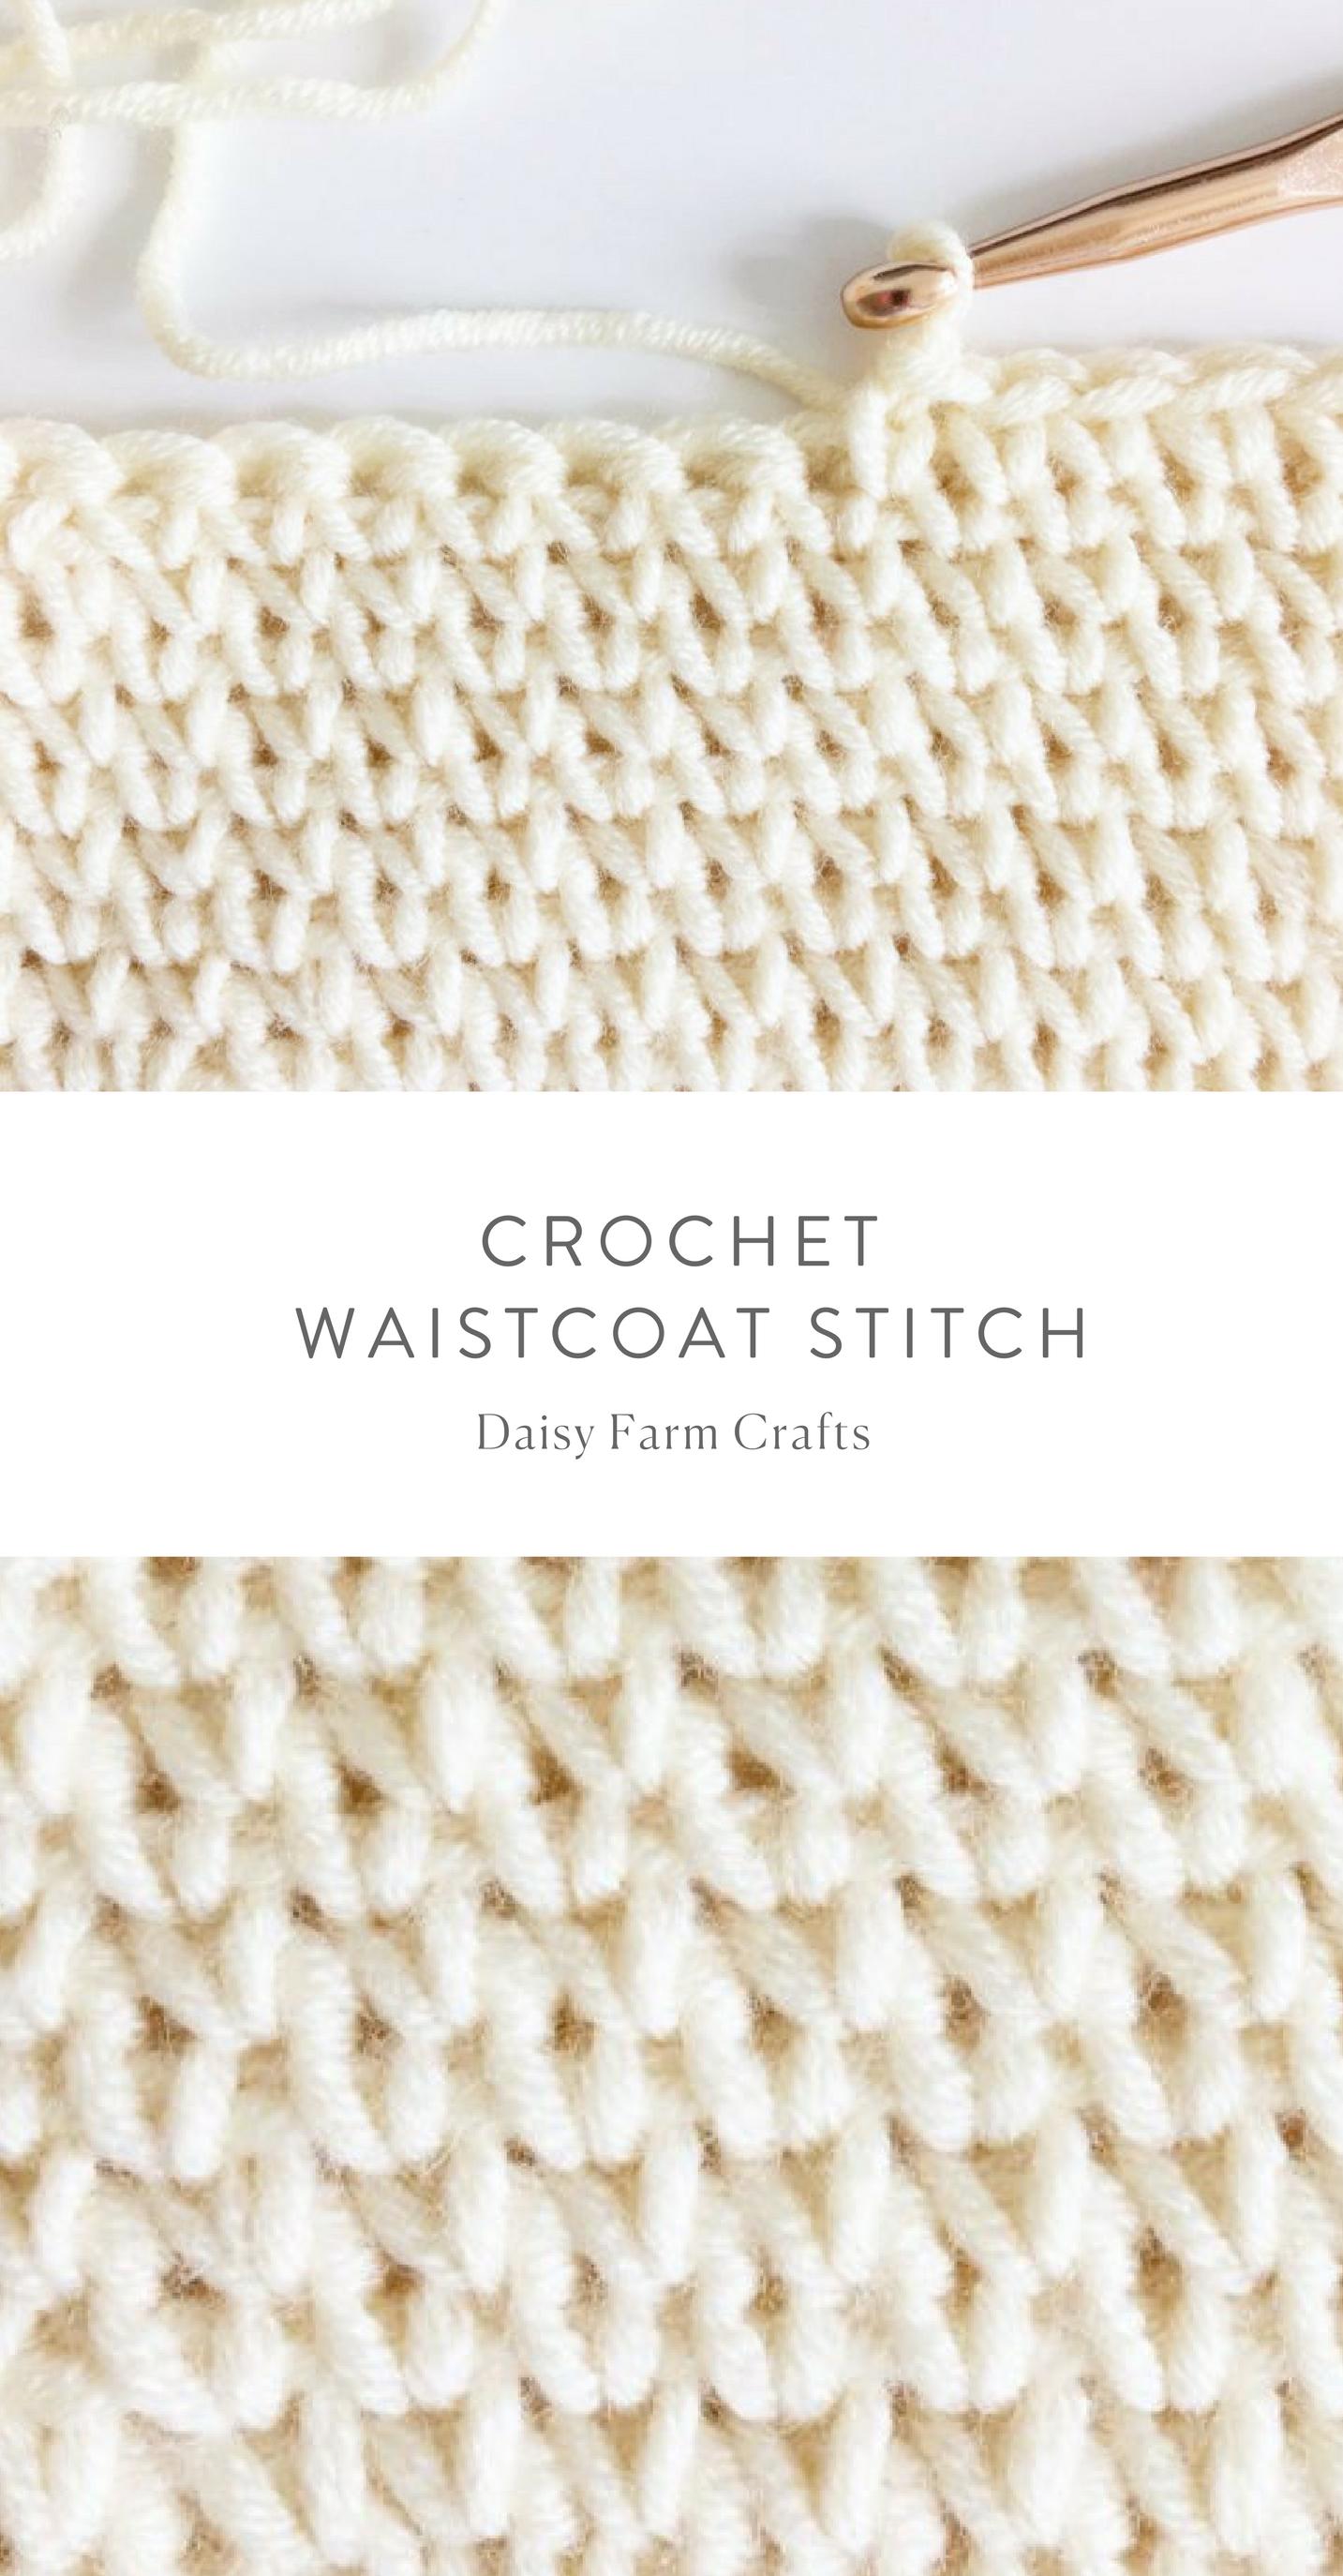 Pin de Erika Diaz De Leon en Crochet | Pinterest | Tejido, Ganchillo ...